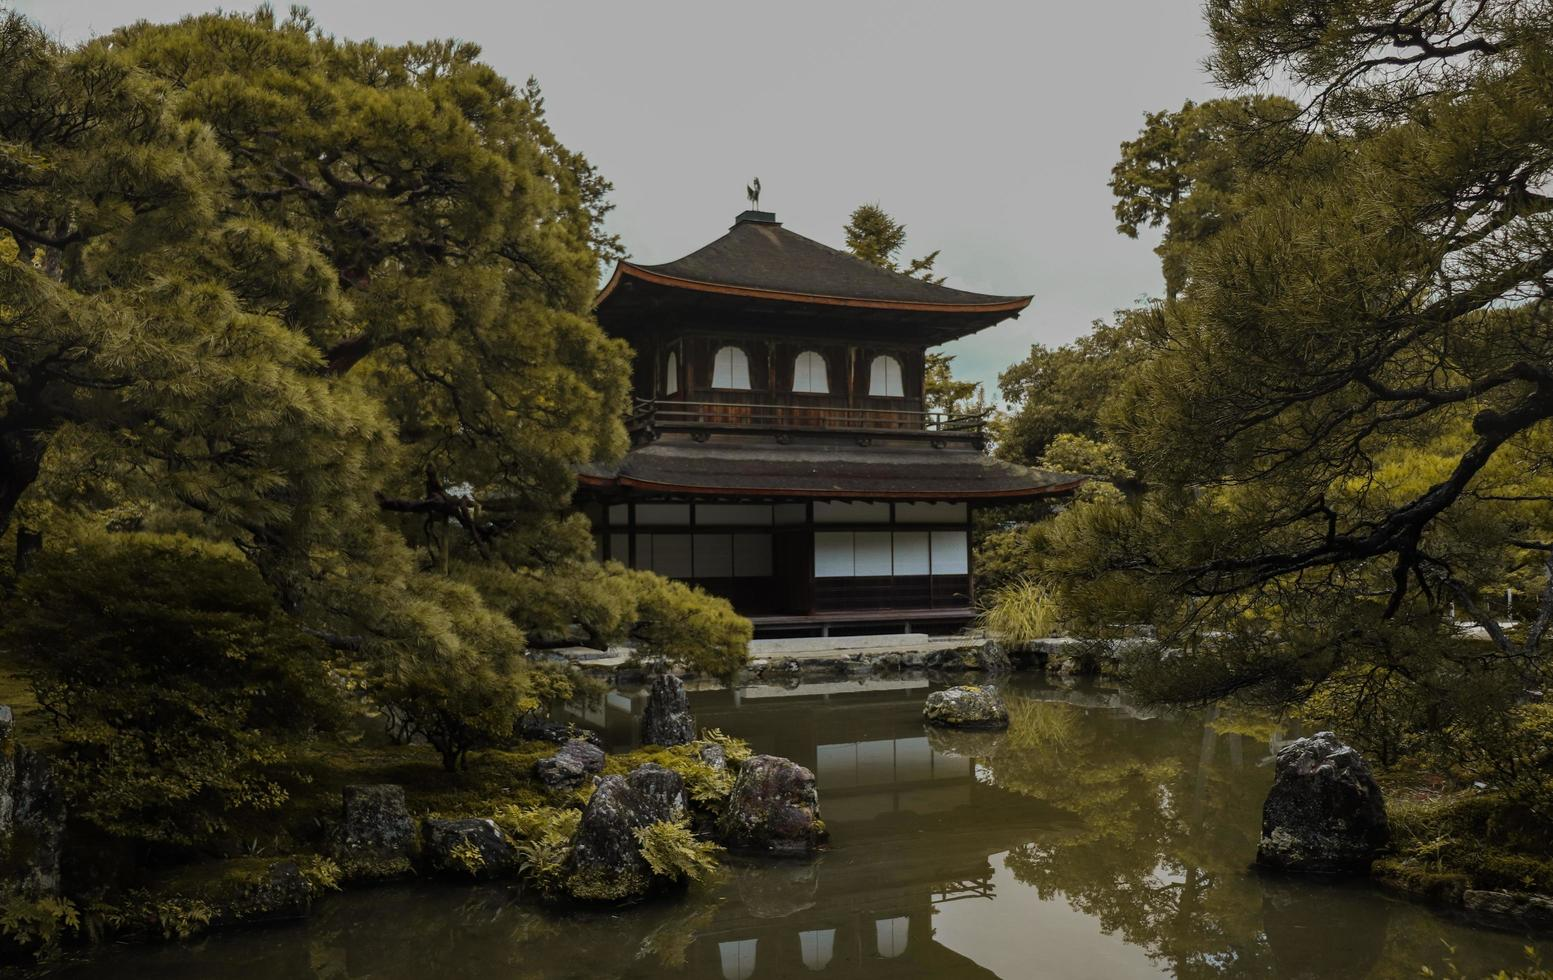 Ginkaku-ji Temple in Kyoto, Japan photo